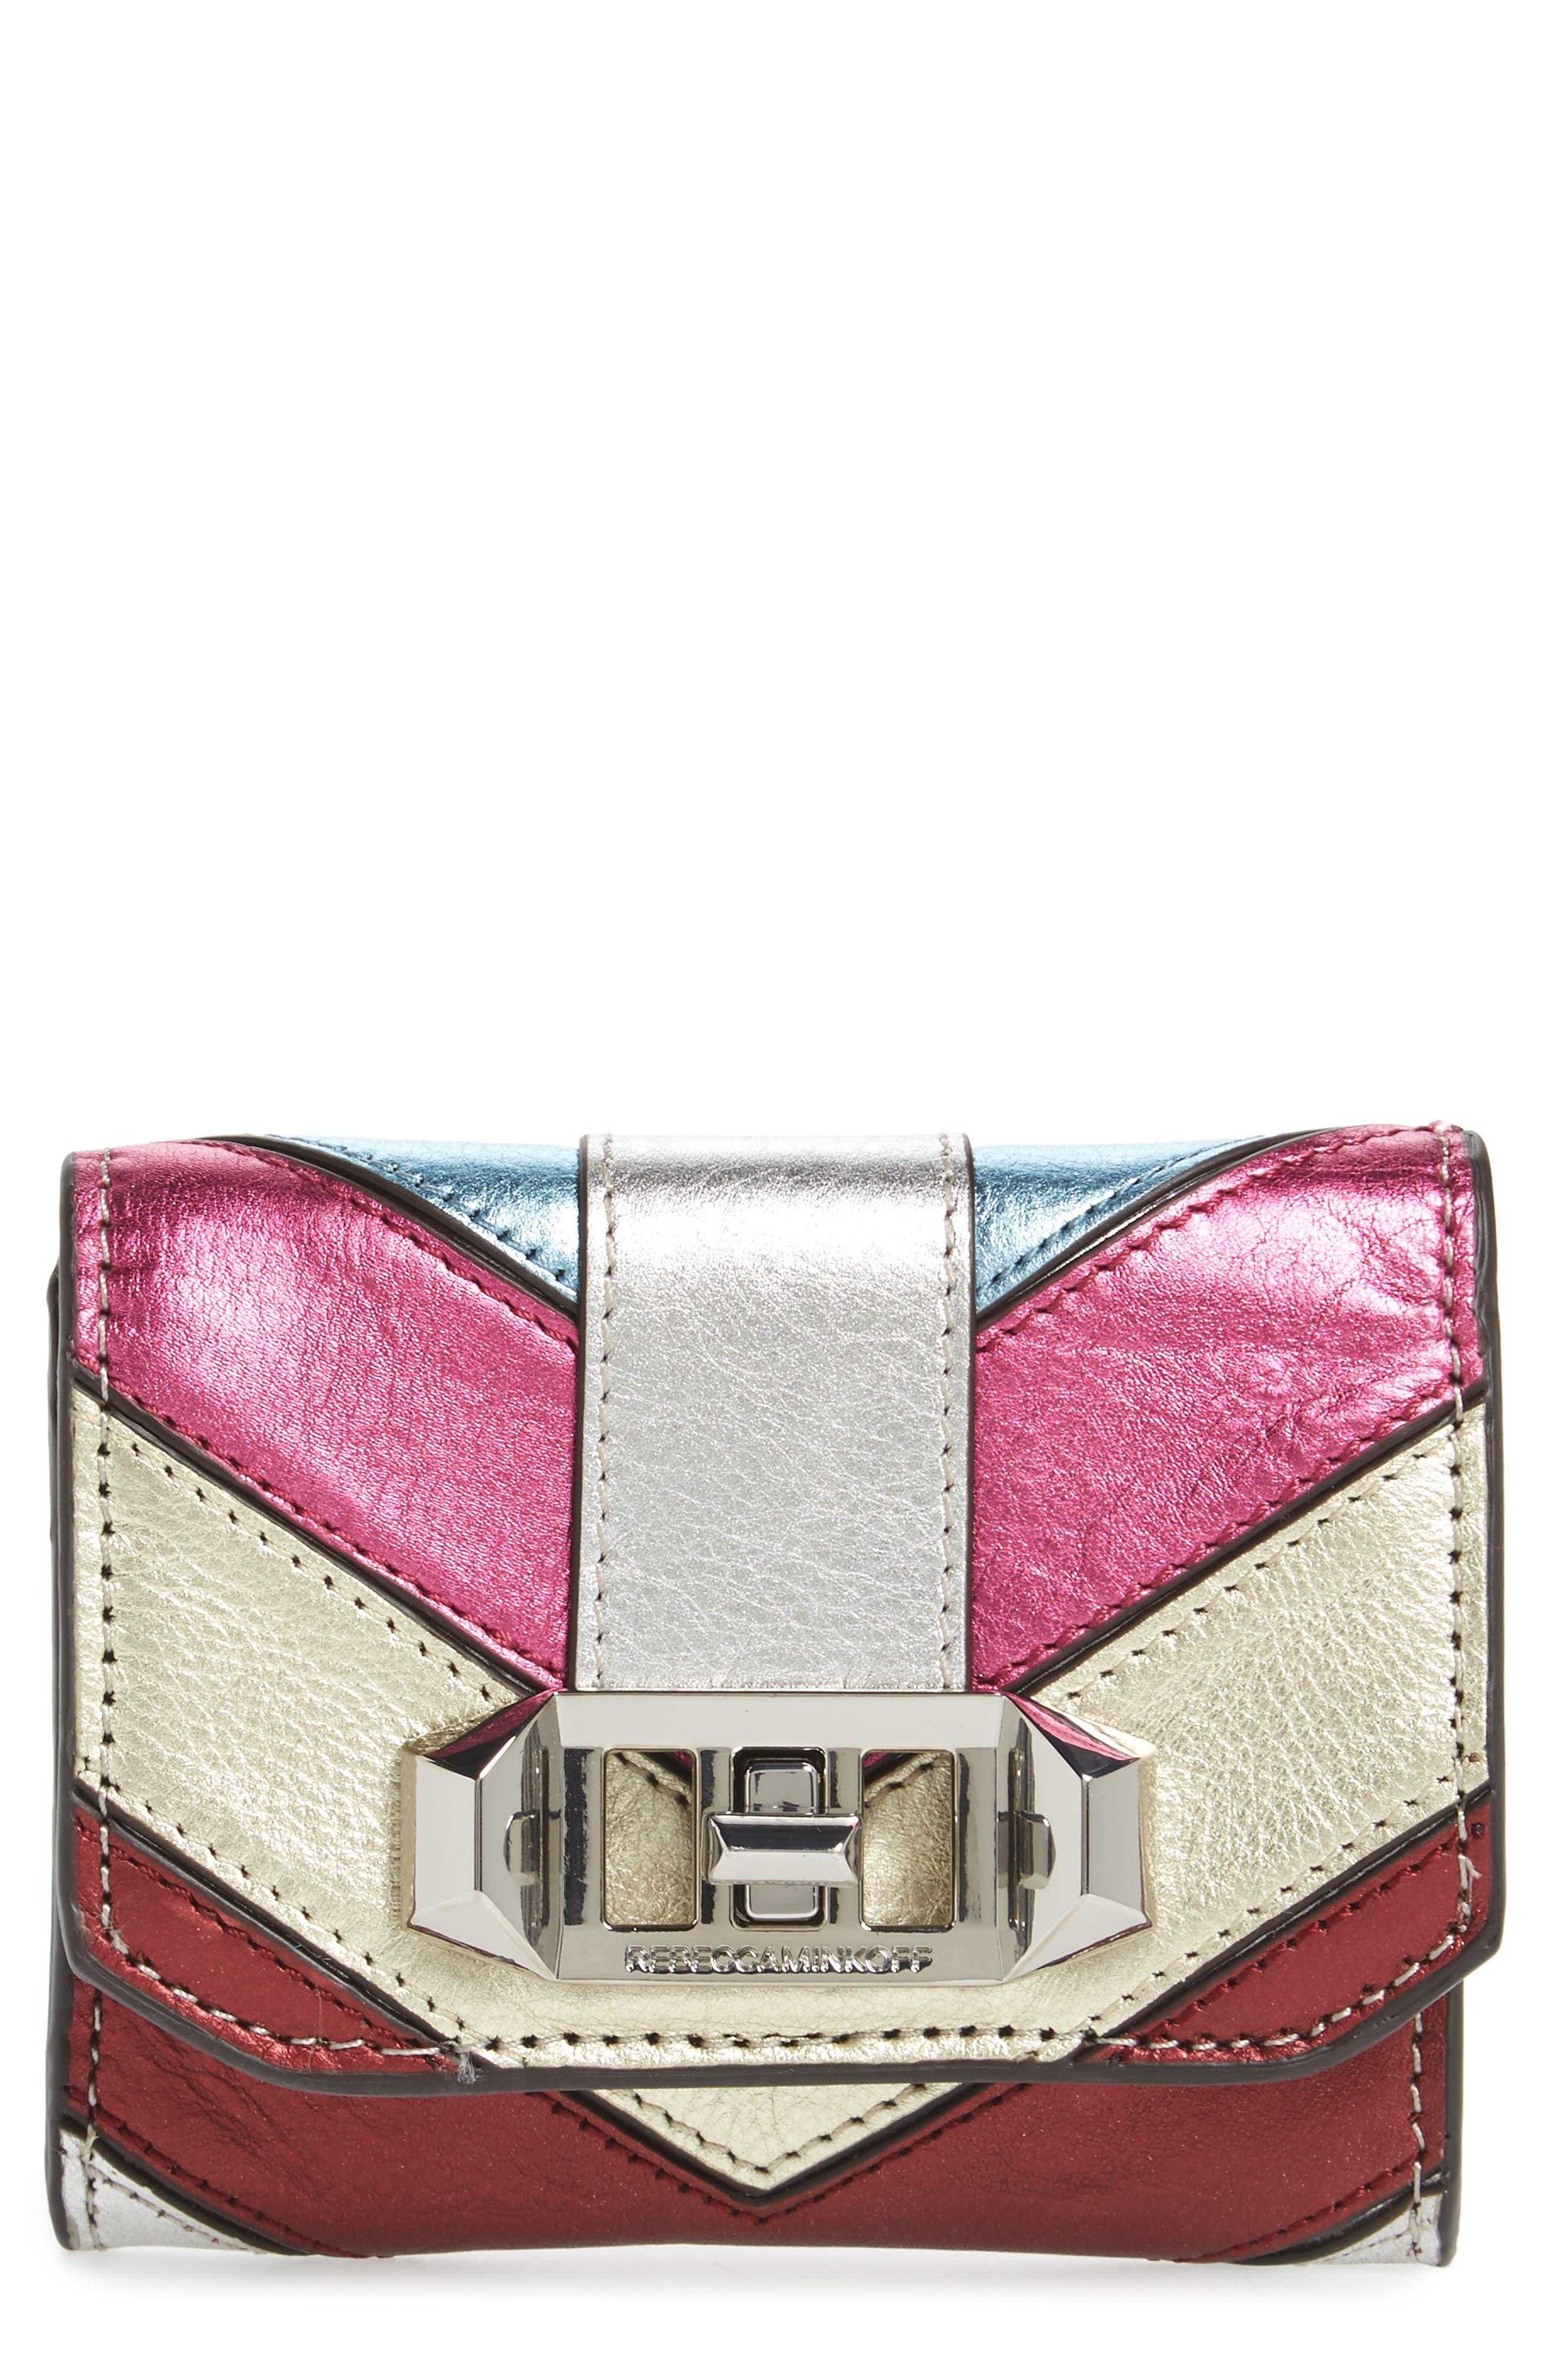 Main Image - Rebecca Minkoff Love Lock Leather Wallet